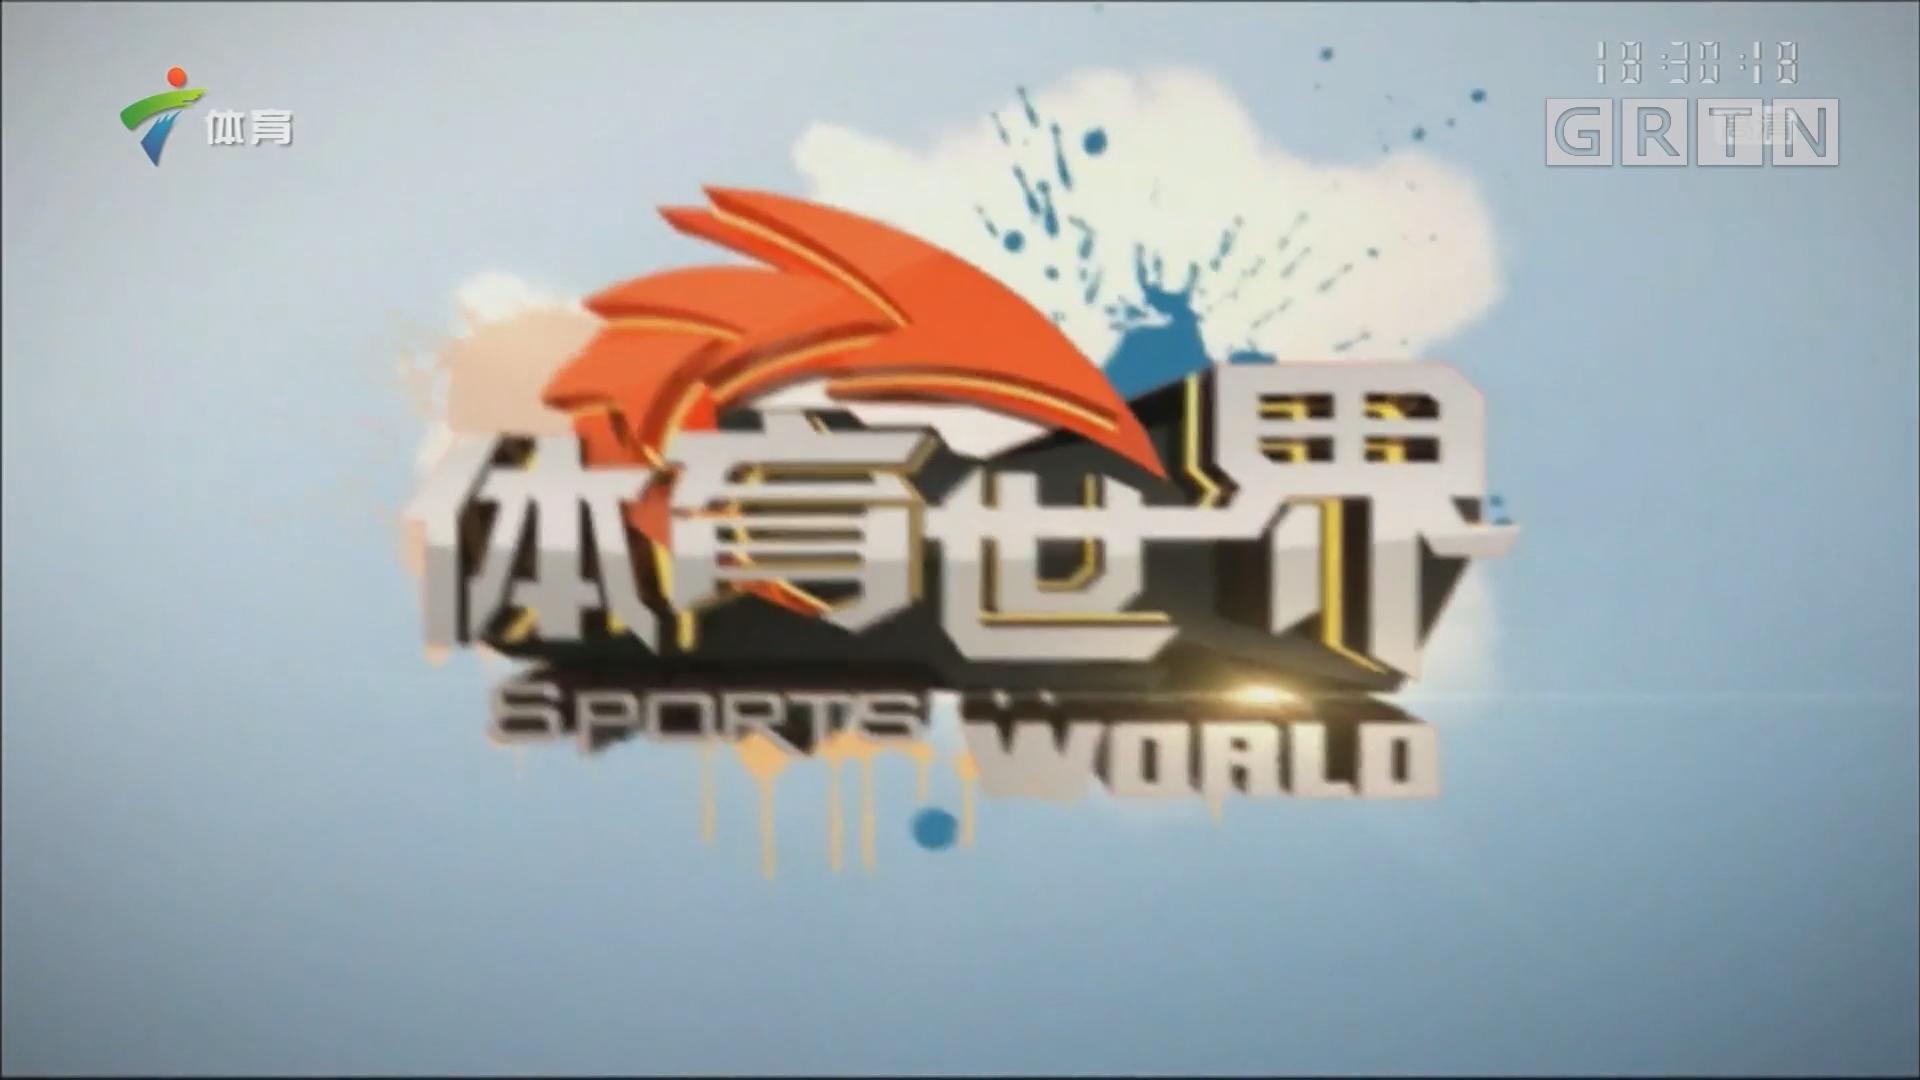 [HD][2018-05-19]体育世界:珠江啤酒2018广东省男篮联赛罗定开幕